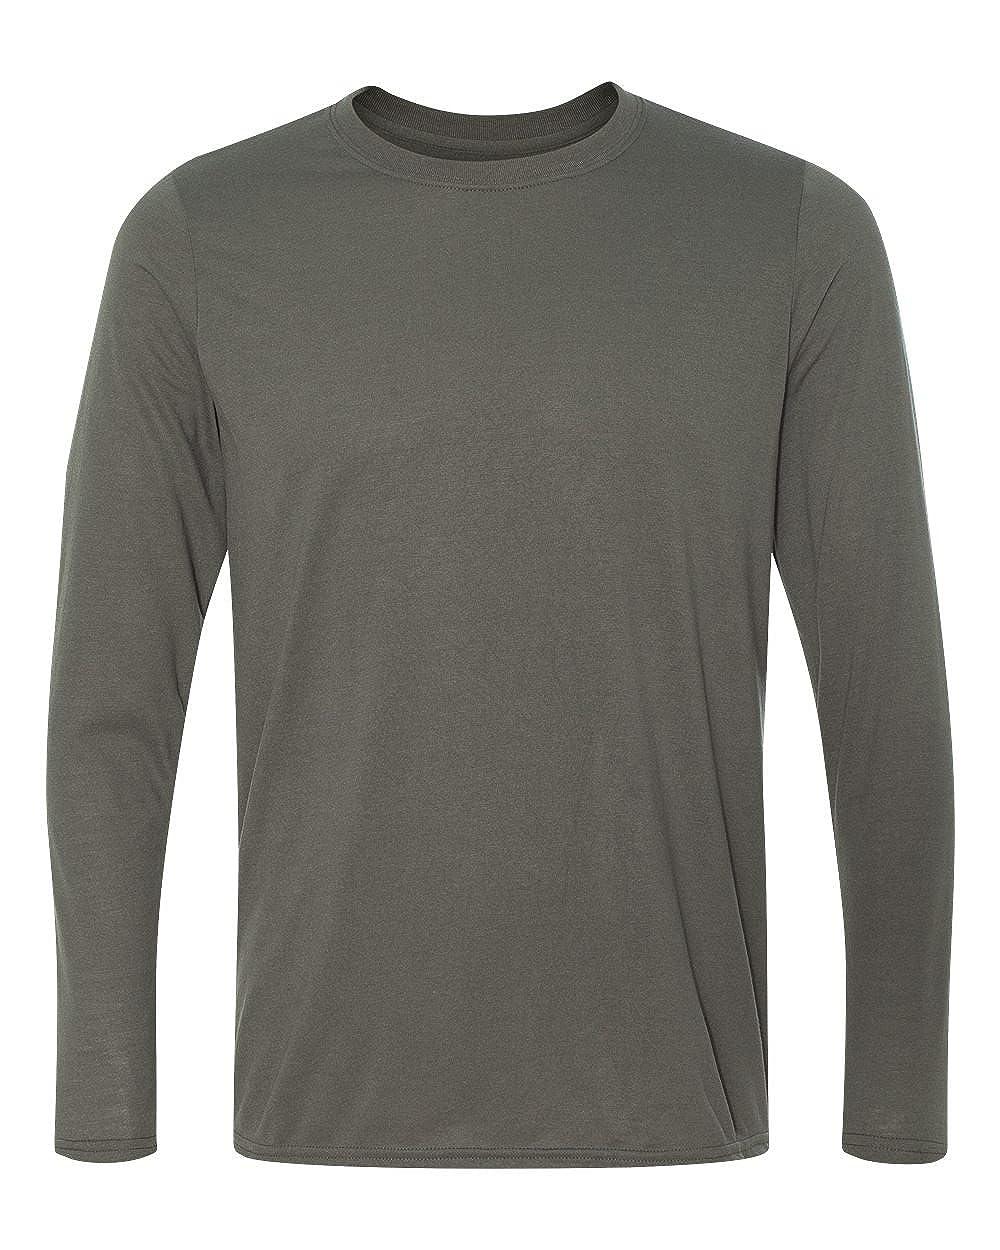 Gildan Mens Wicking Crewneck Freshcare Jersey T-Shirt